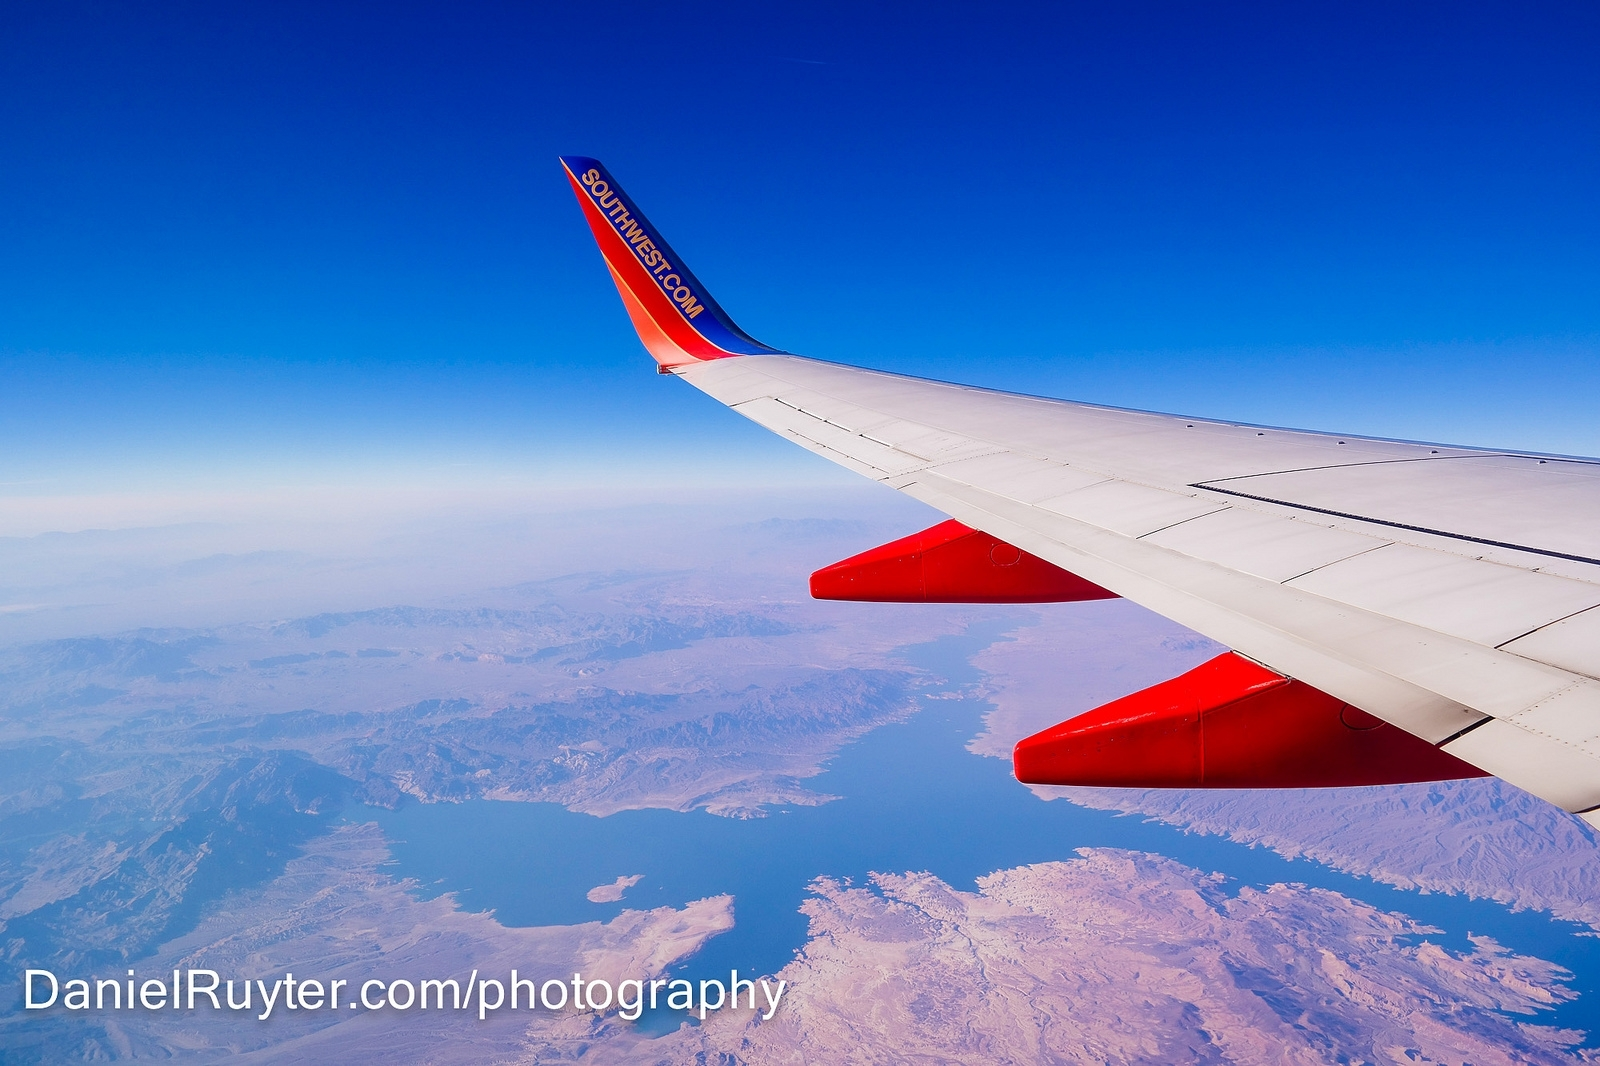 ae722a966f854fa4deaf_airplane.JPG